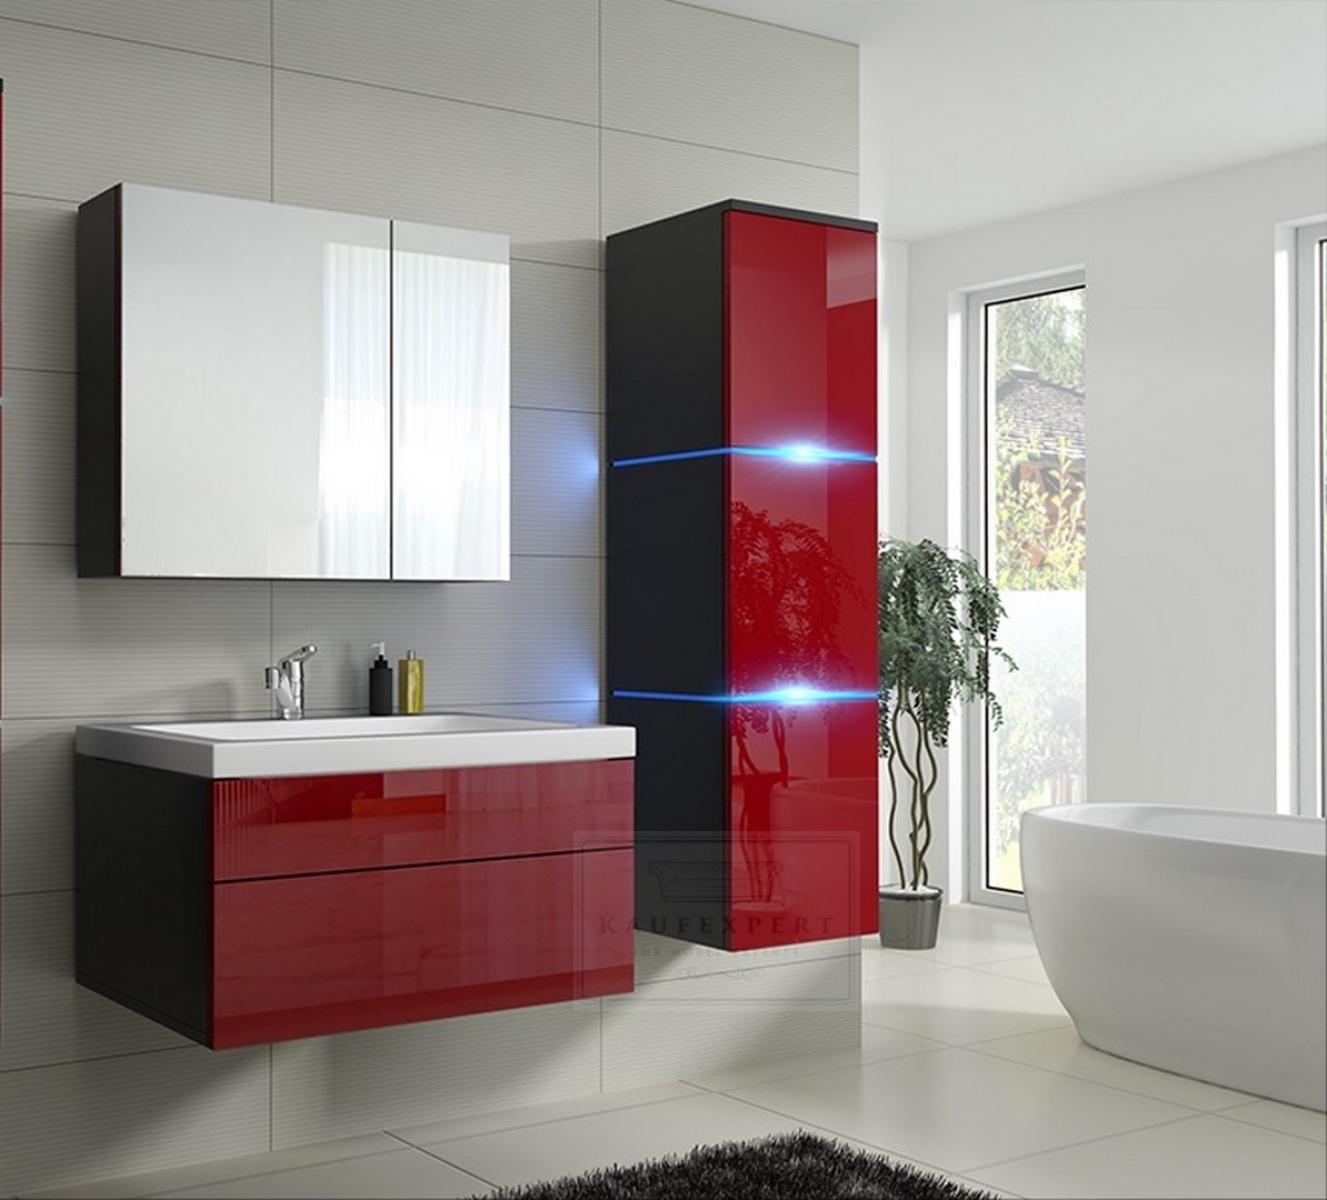 Favorit KAUFEXPERT - Badmöbel-Set Lux 1 NEW Rot Hochglanz/Schwarz KERAMIK AY17